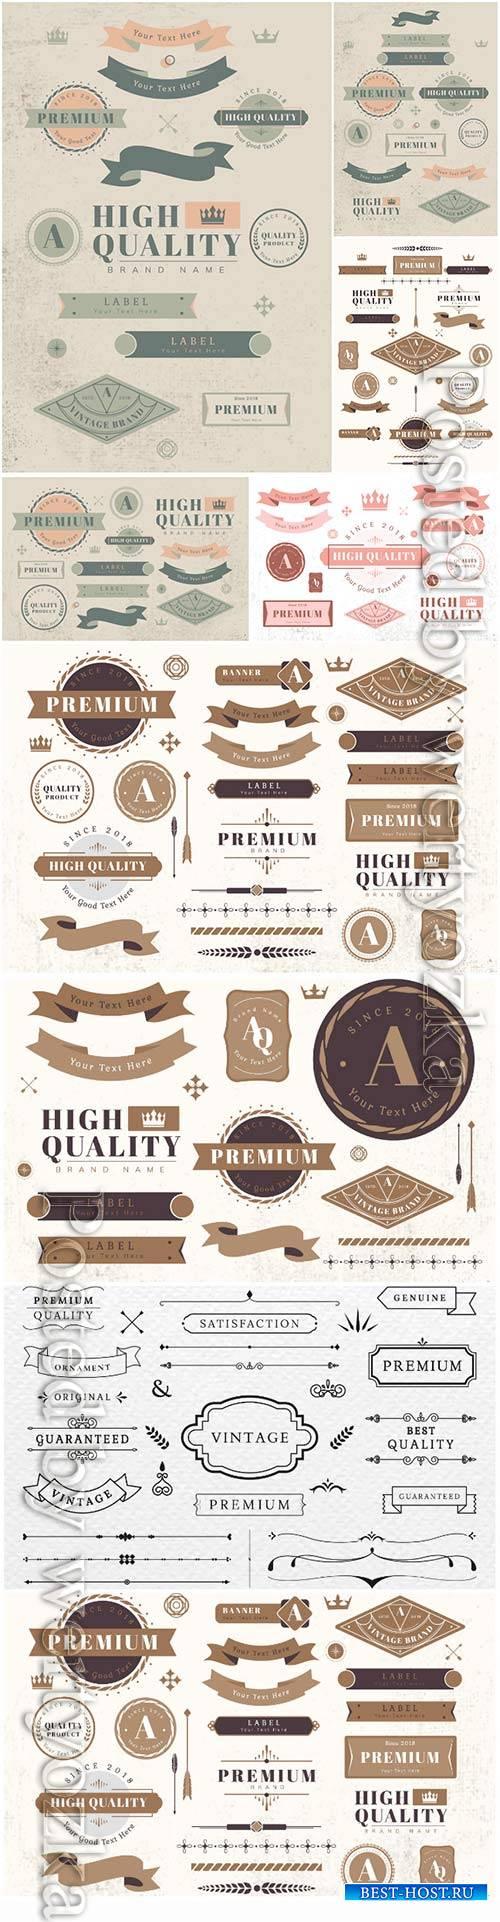 Vintage labels and badges decorative vector elements